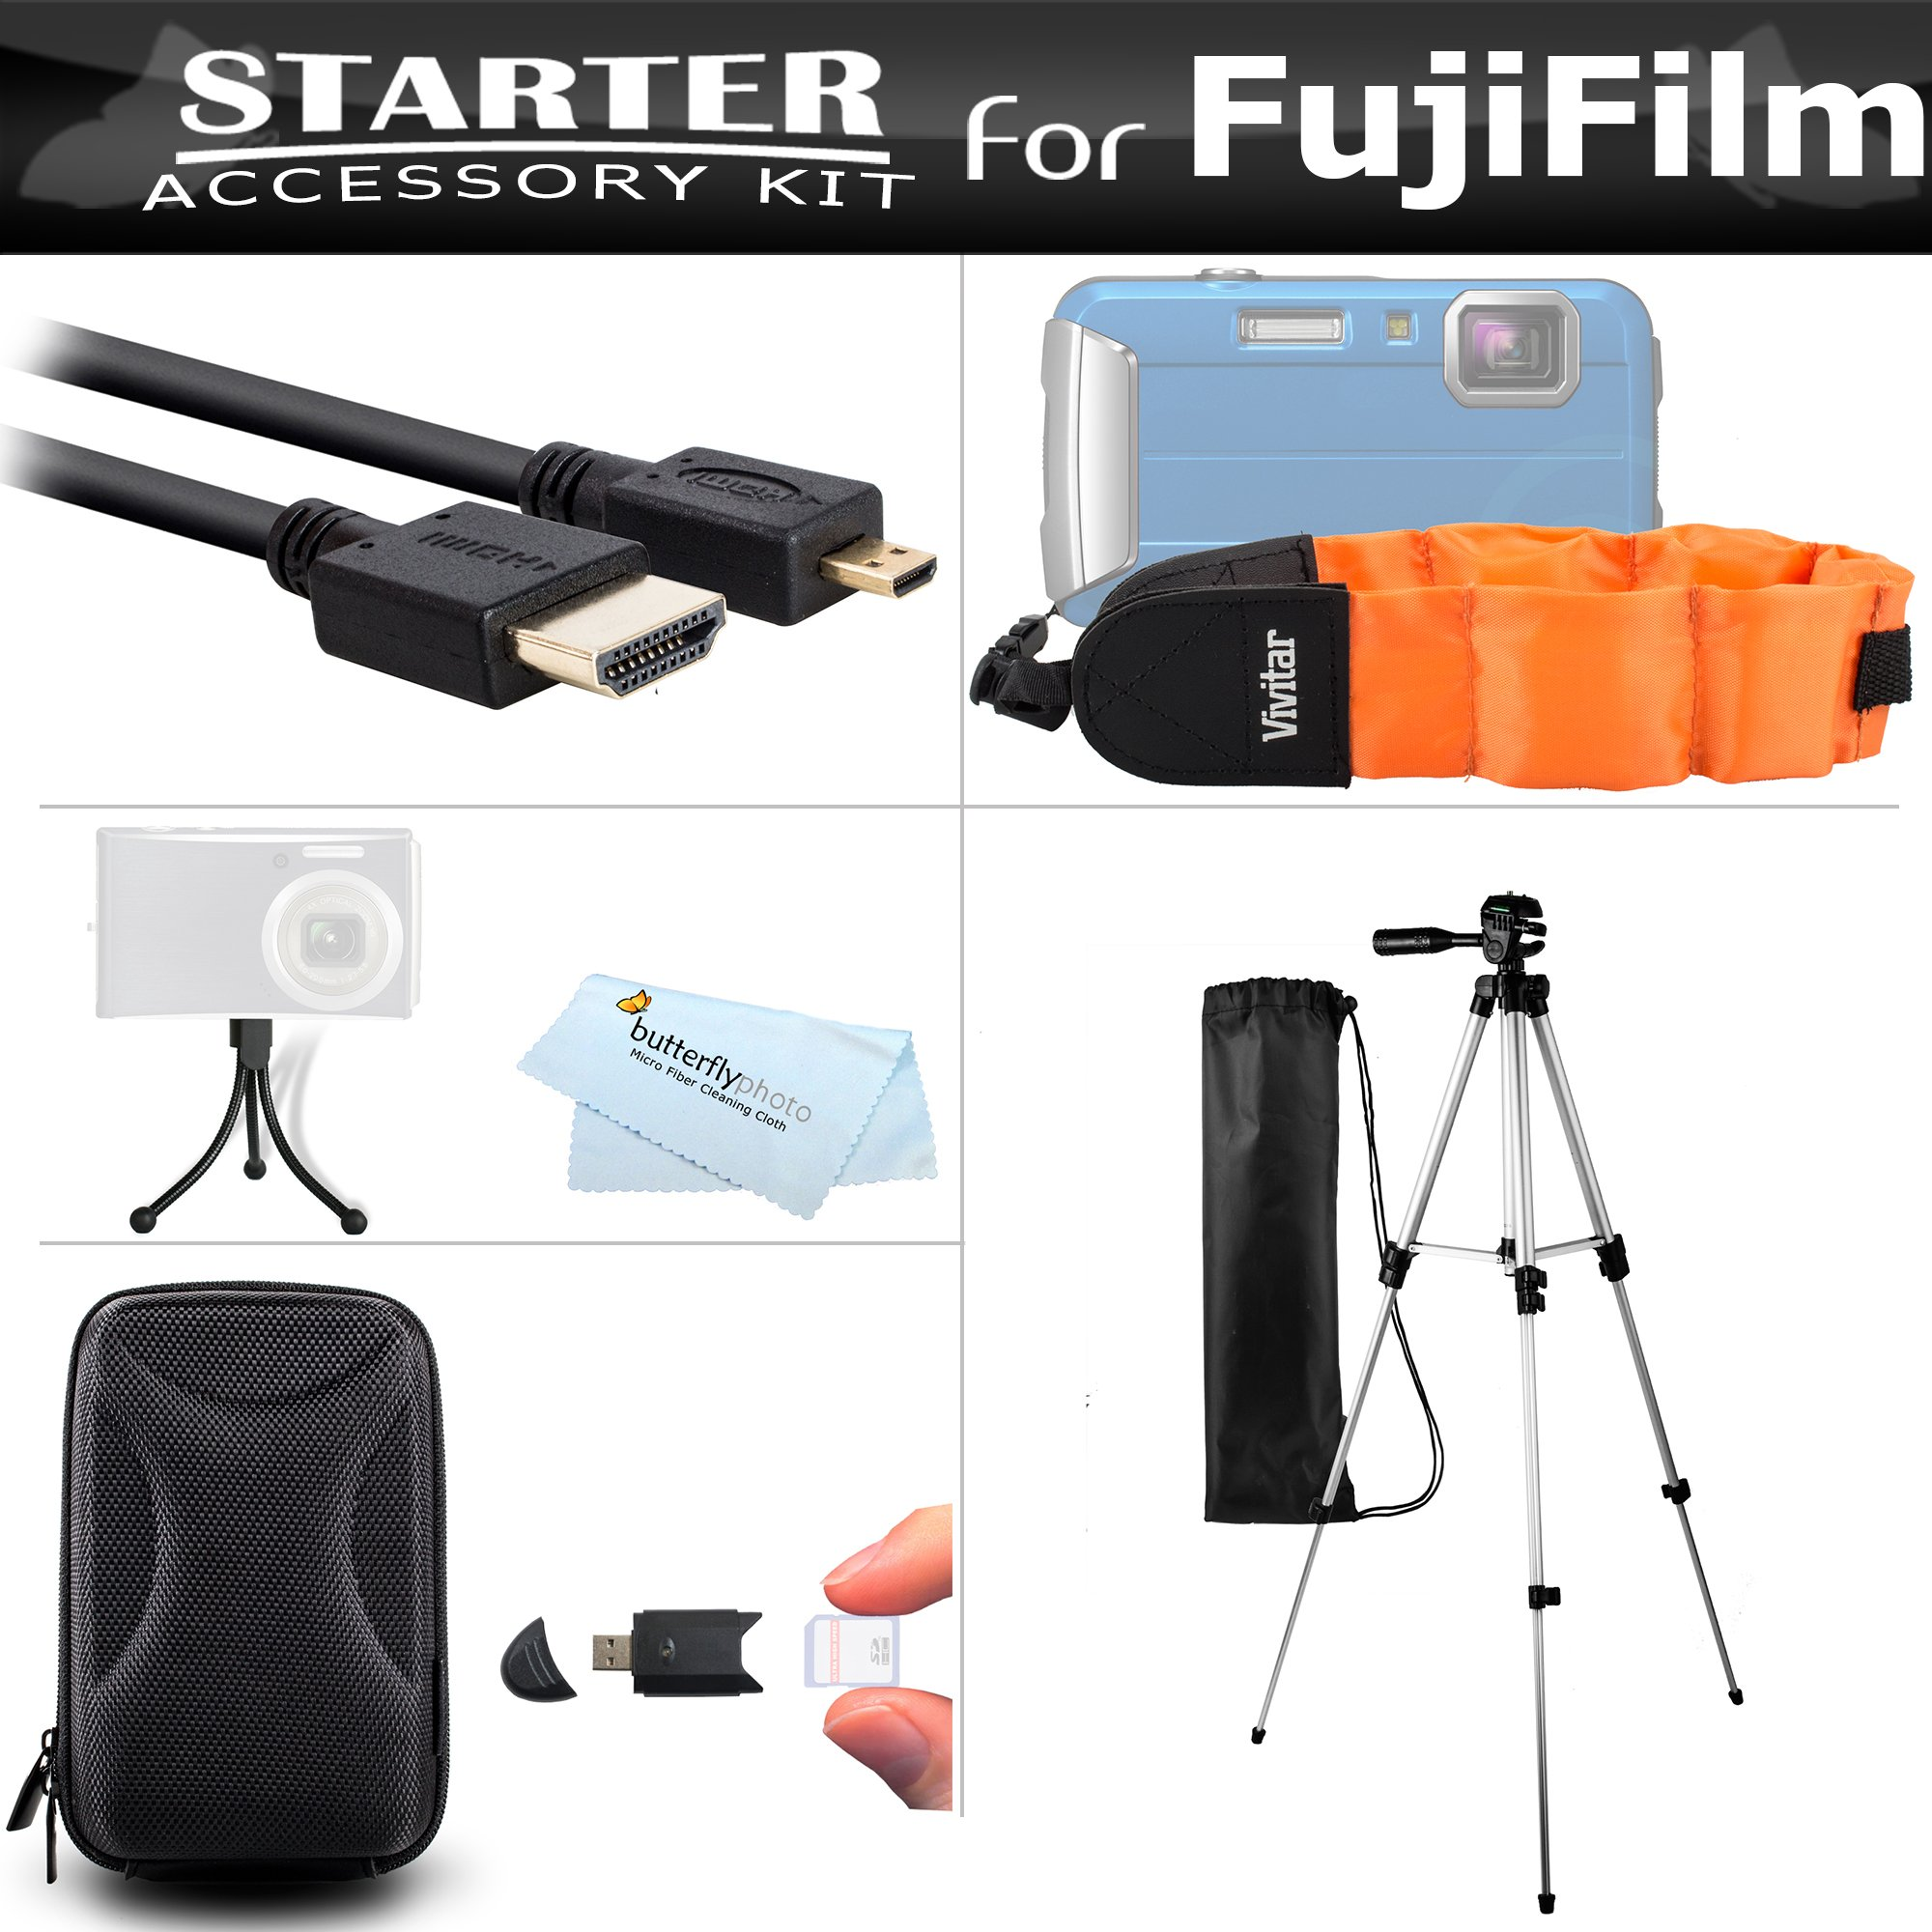 Starter Accessories Kit For The Fuji Fujifilm FinePix XP70, XP80, XP90, XP120 Waterproof Digital Camera Includes Carrying Case + 50'' Tripod W/Case + Micro HDMI Cable + Float Strap + Mini Tripod + More